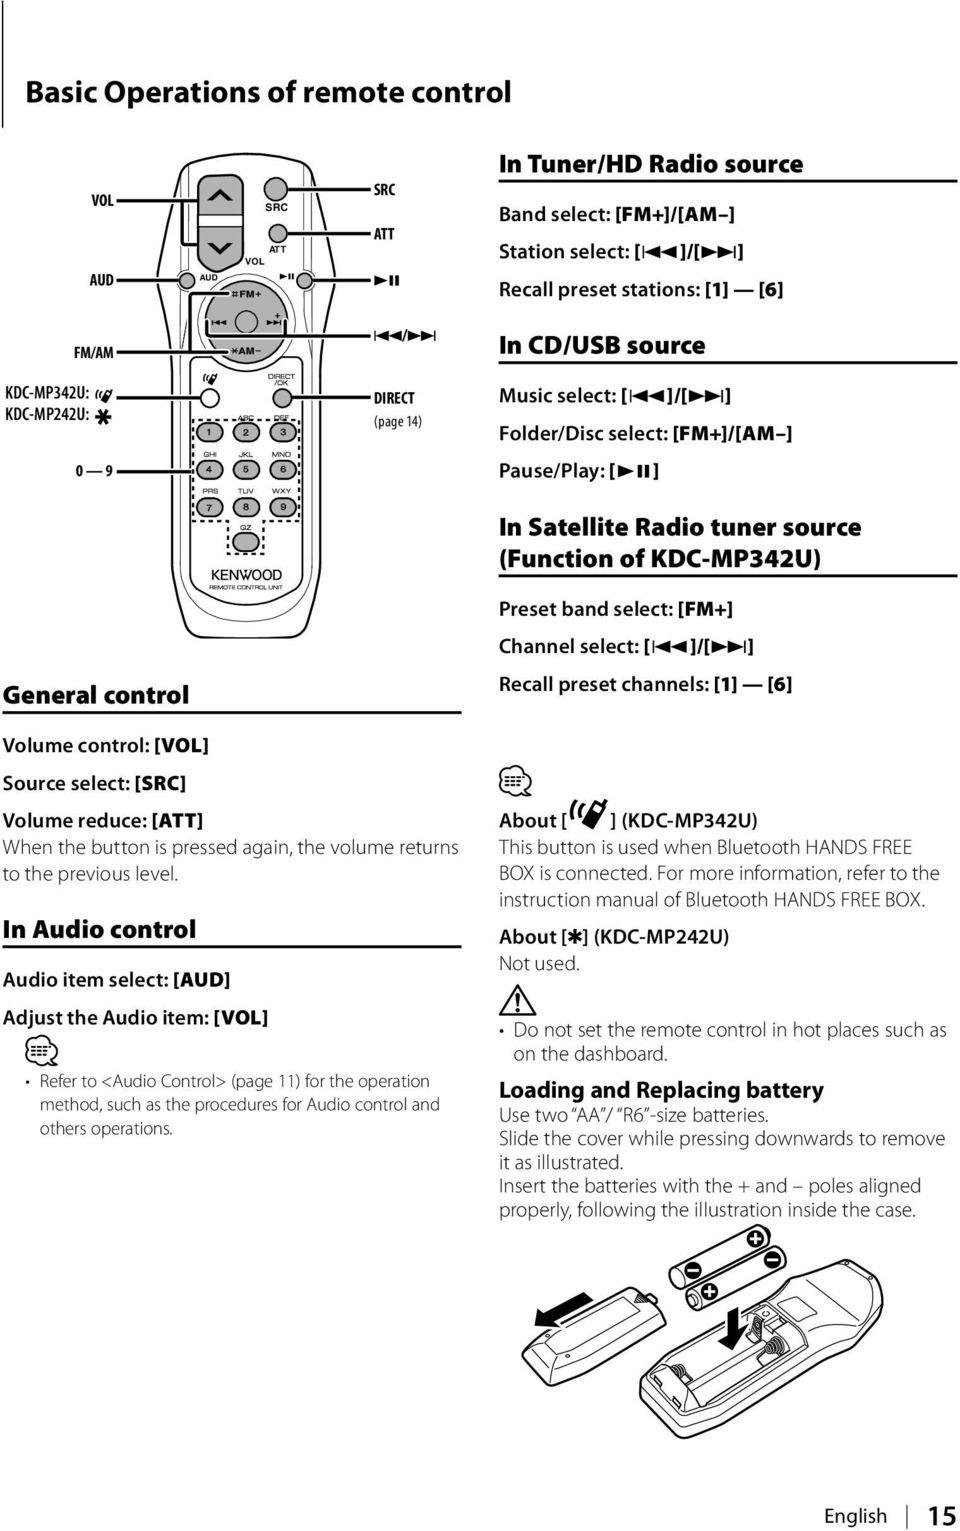 [DIAGRAM_38IS]  OF_3679] Kdc Mp342U Wiring Diagram Wiring Diagram | Kenwood Kdc Mp342u Wiring Diagram |  | Abole Penghe Inama Mohammedshrine Librar Wiring 101